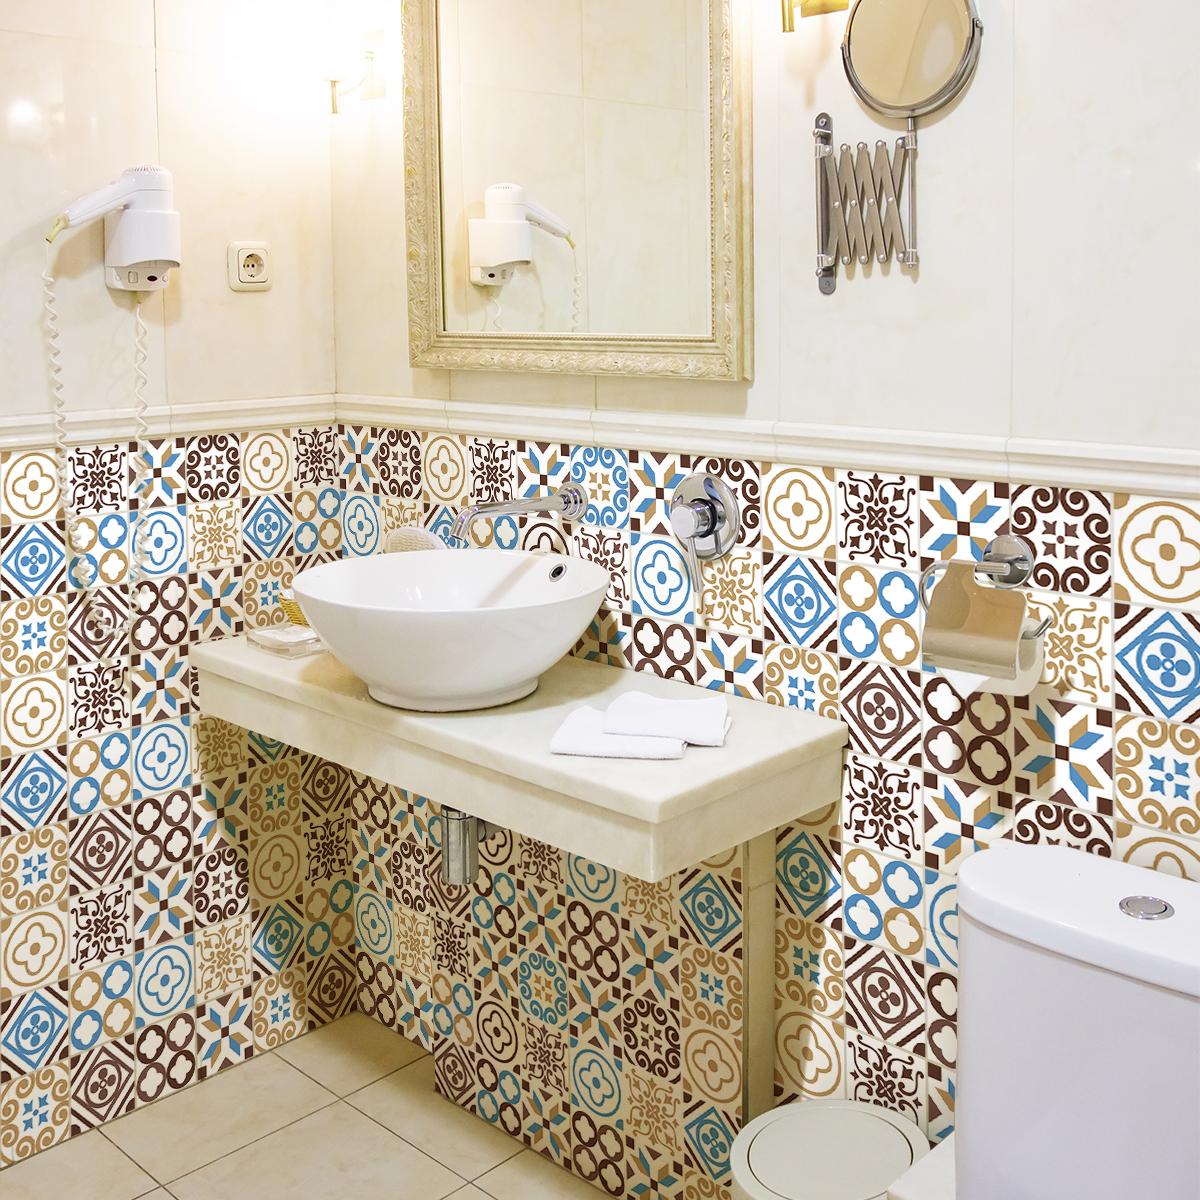 30 stickers carreaux de ciment azulejos kelia cuisine carrelages ambiance sticker. Black Bedroom Furniture Sets. Home Design Ideas